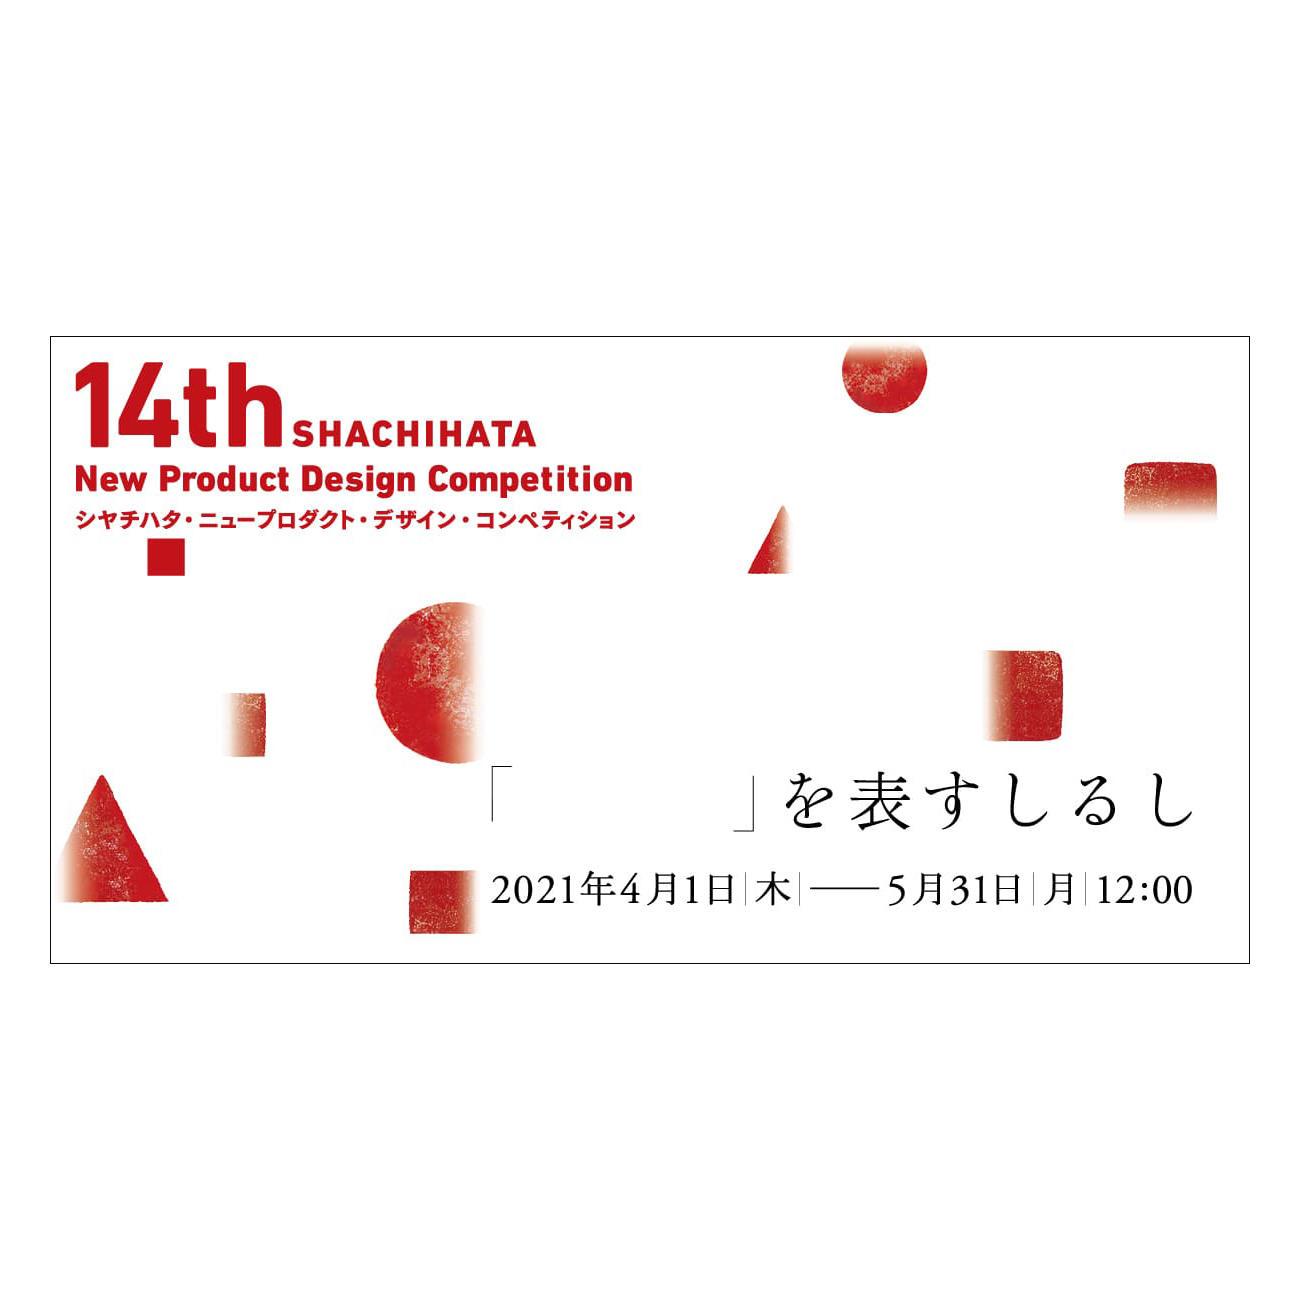 14th シヤチハタ・ニュープロダクト・デザイン・コンペティション開催決定 2021.4.1 Thu 募集開始